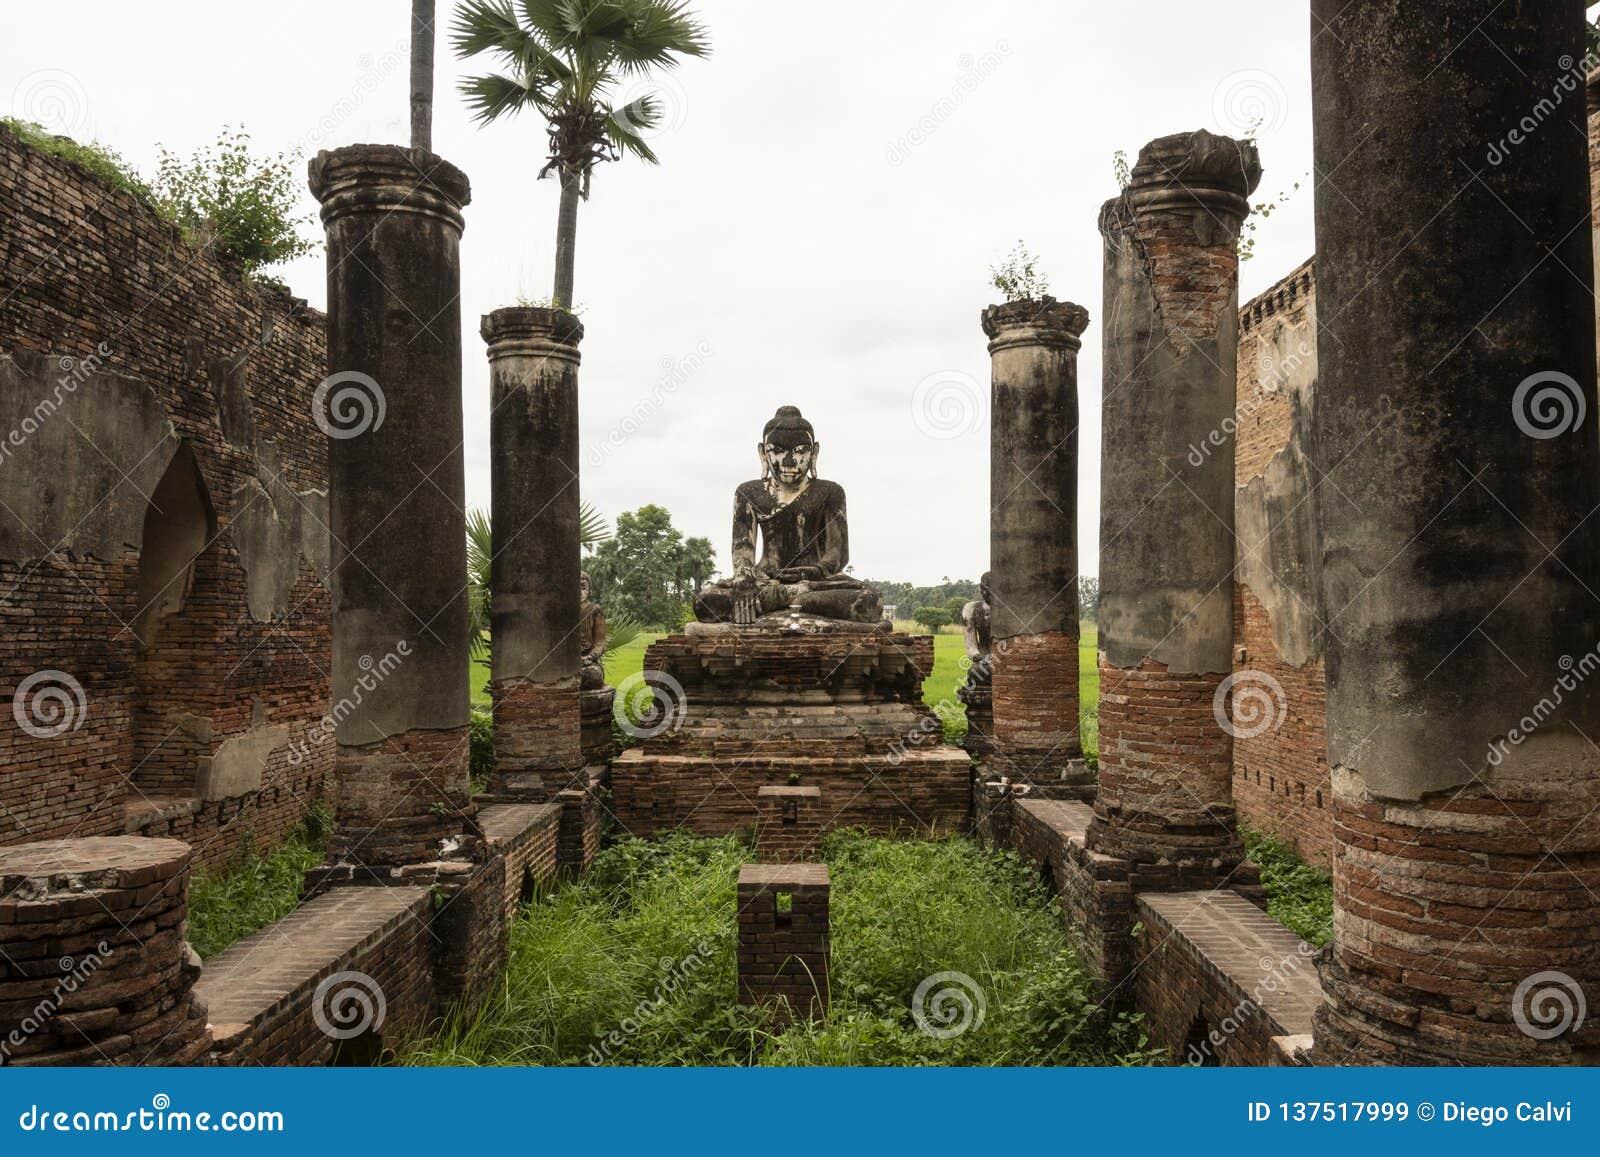 Ruins of an old Burmese temple